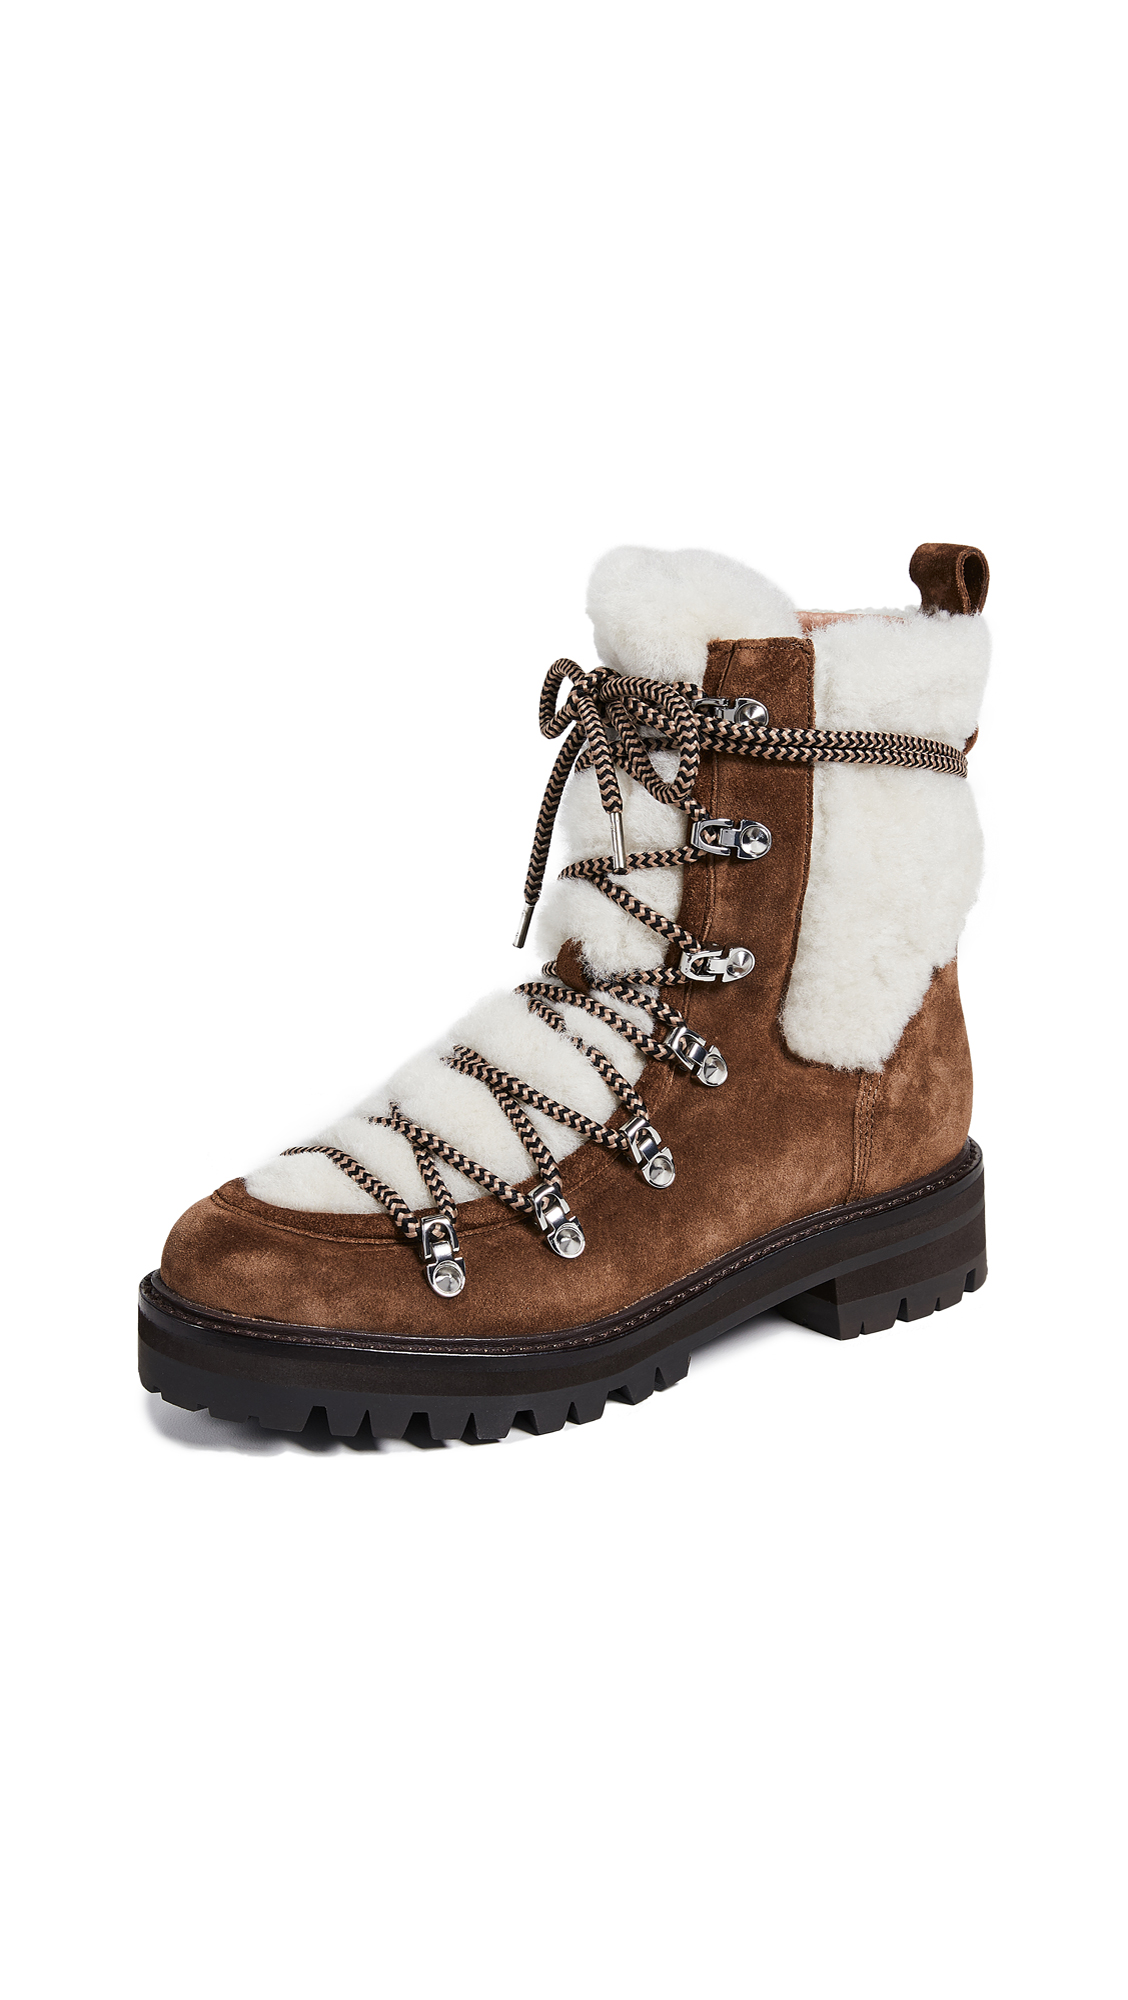 Sigerson Morrison Isla Shearling Boots - Farro/Natural